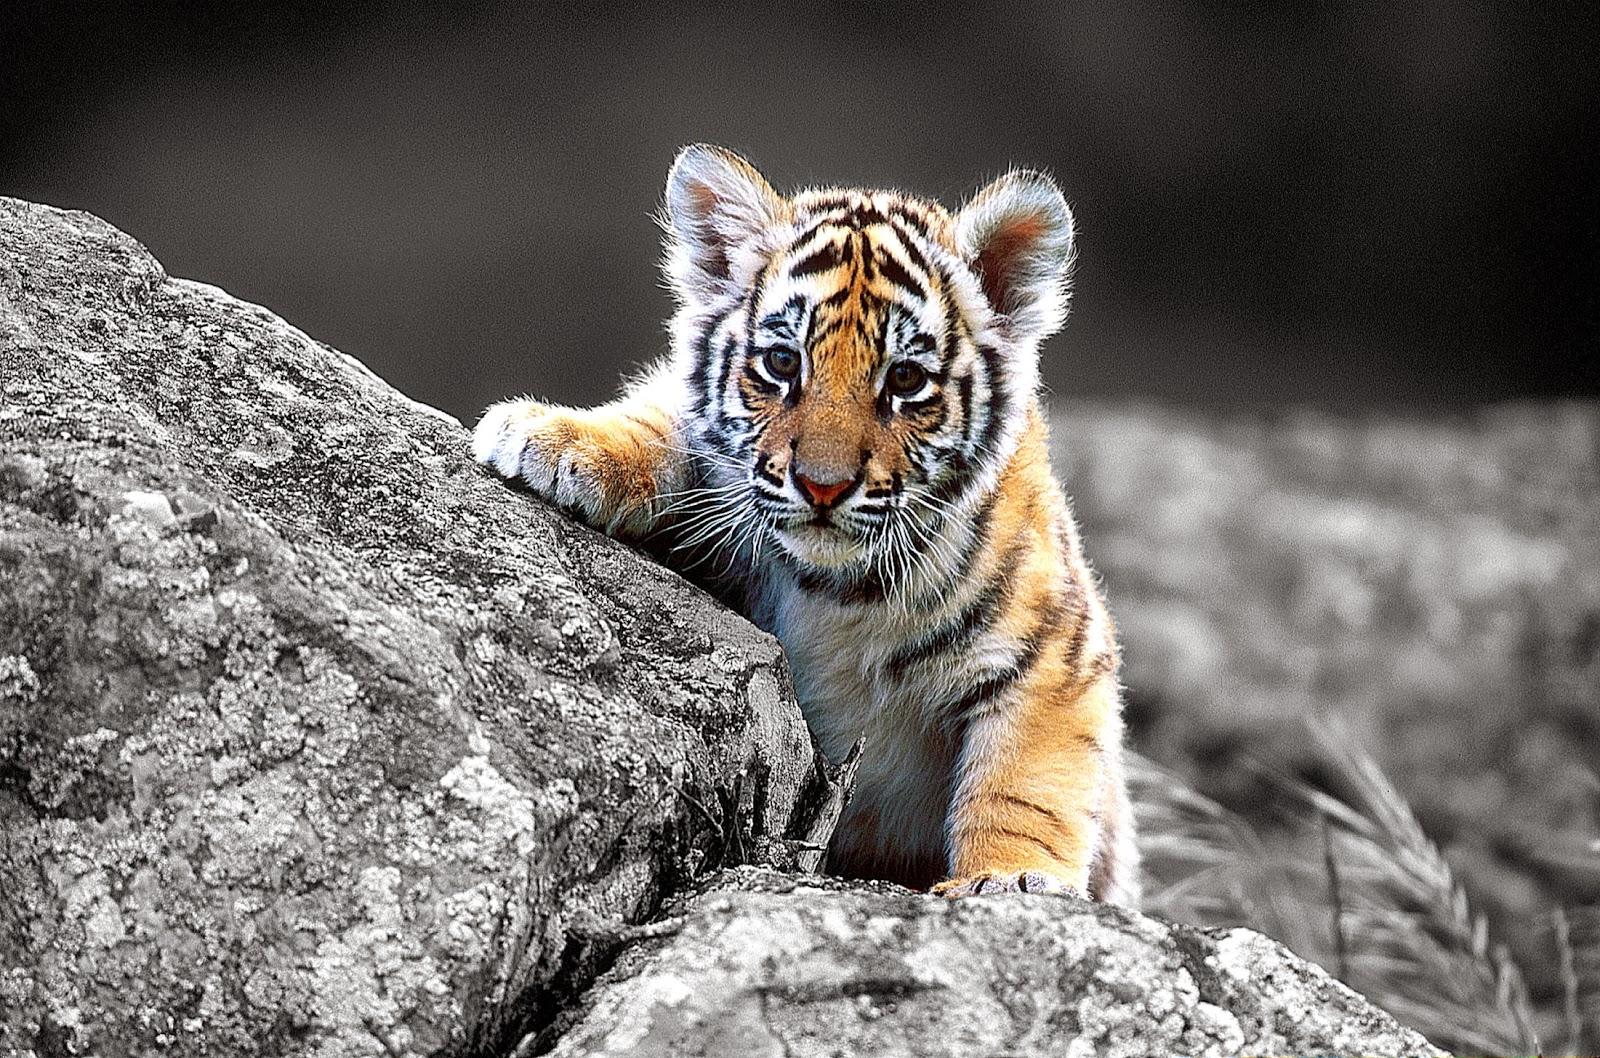 Baby Tiger HD wallpaper